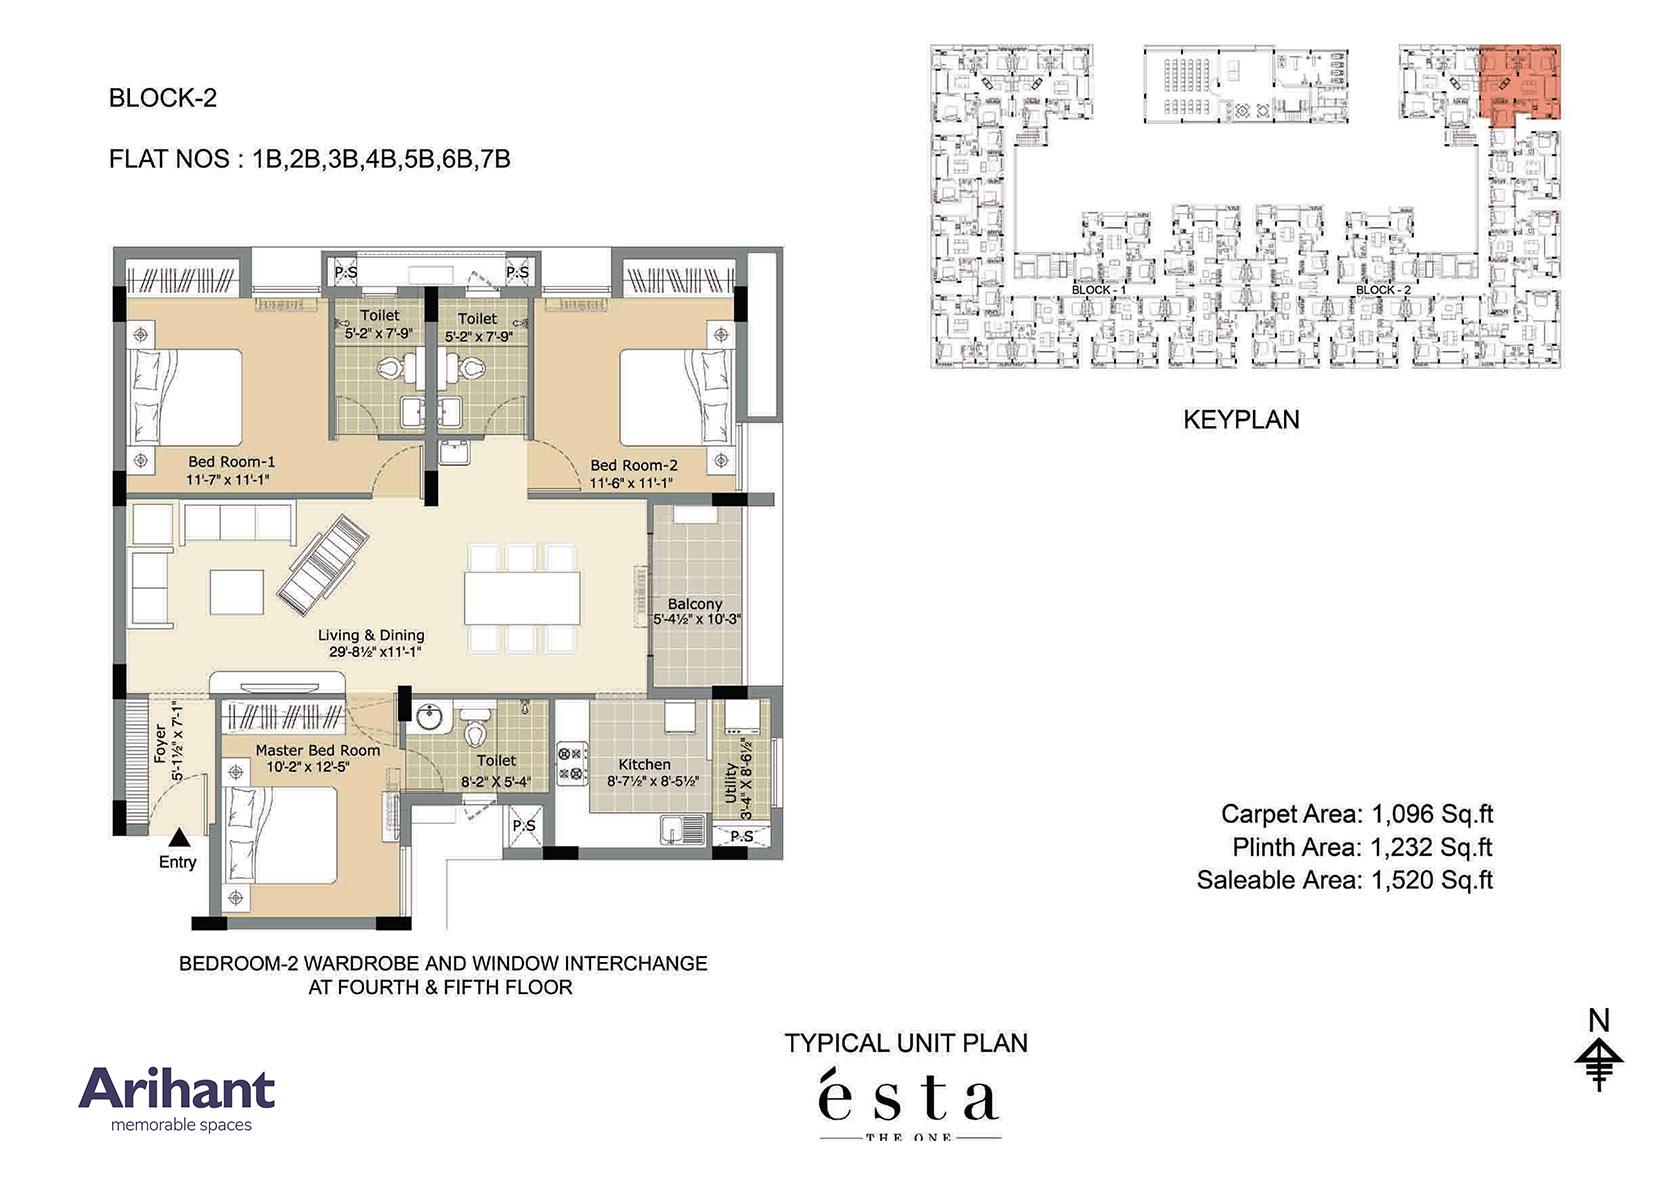 Arihant - Esta_Typical Unit Plan - Block 2 - Type B